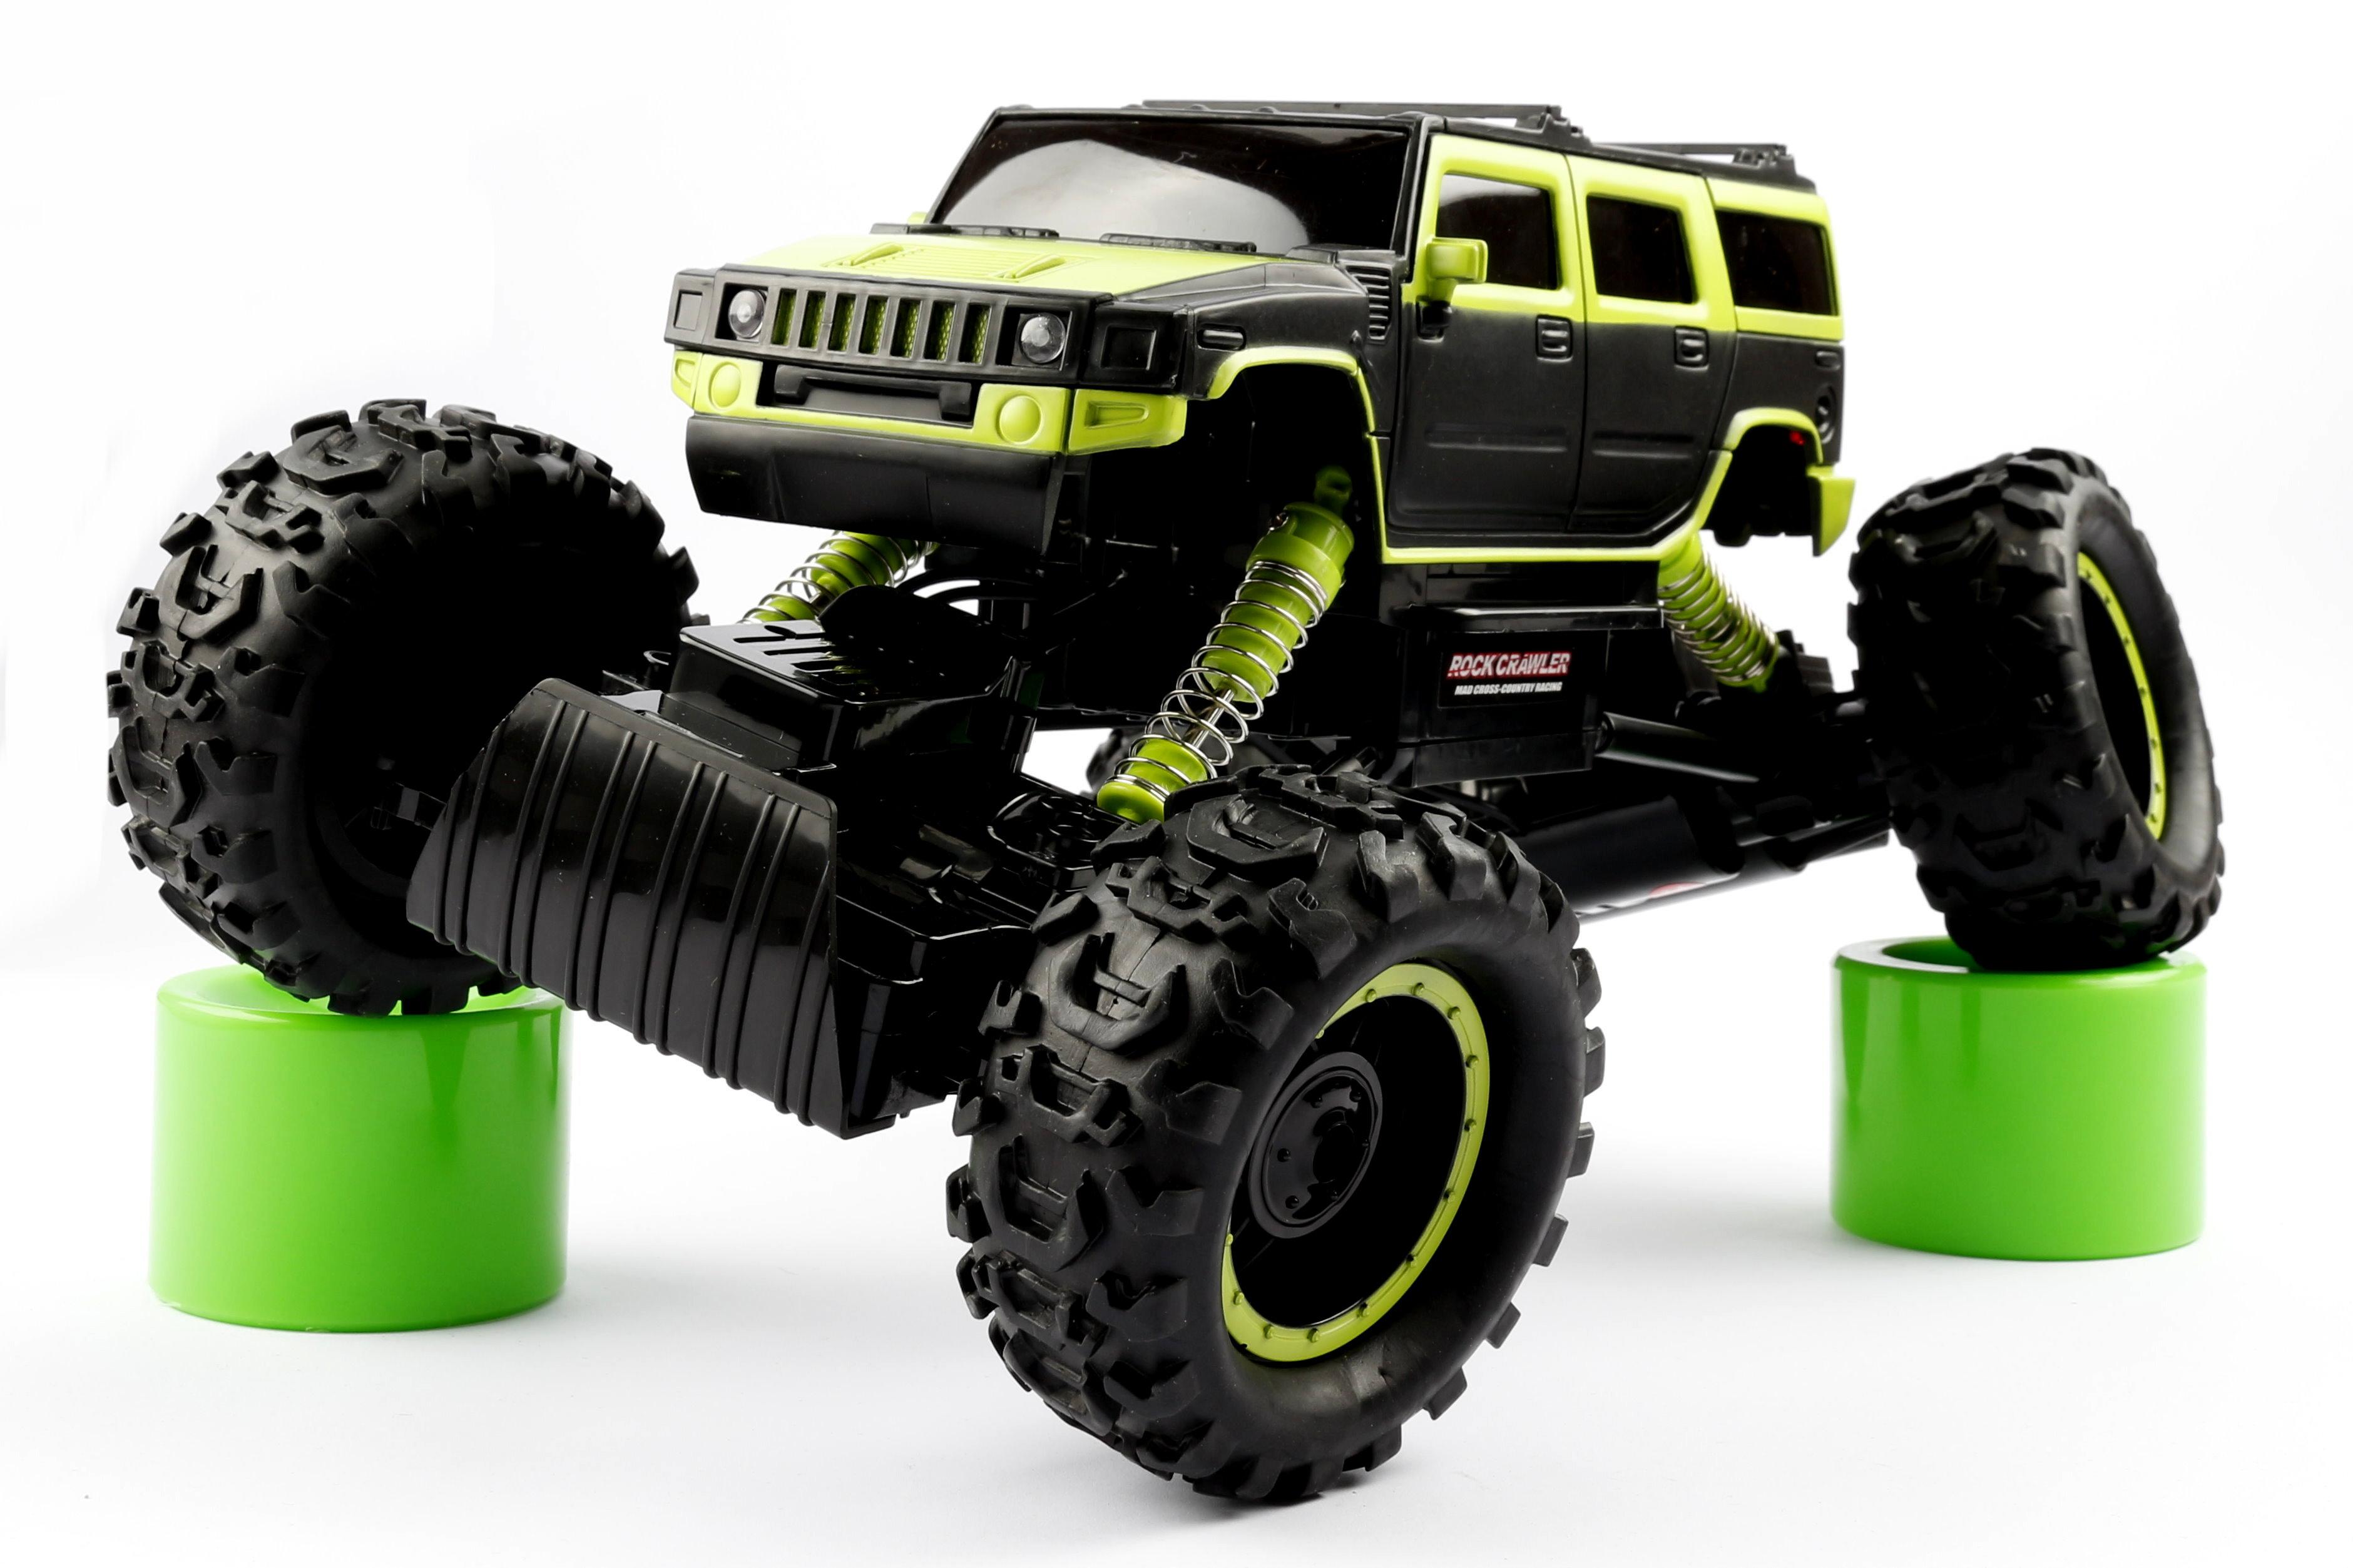 Ferngesteuertes Auto f?r Kinder  XL Rock Crawler (3 Modelle, je nach